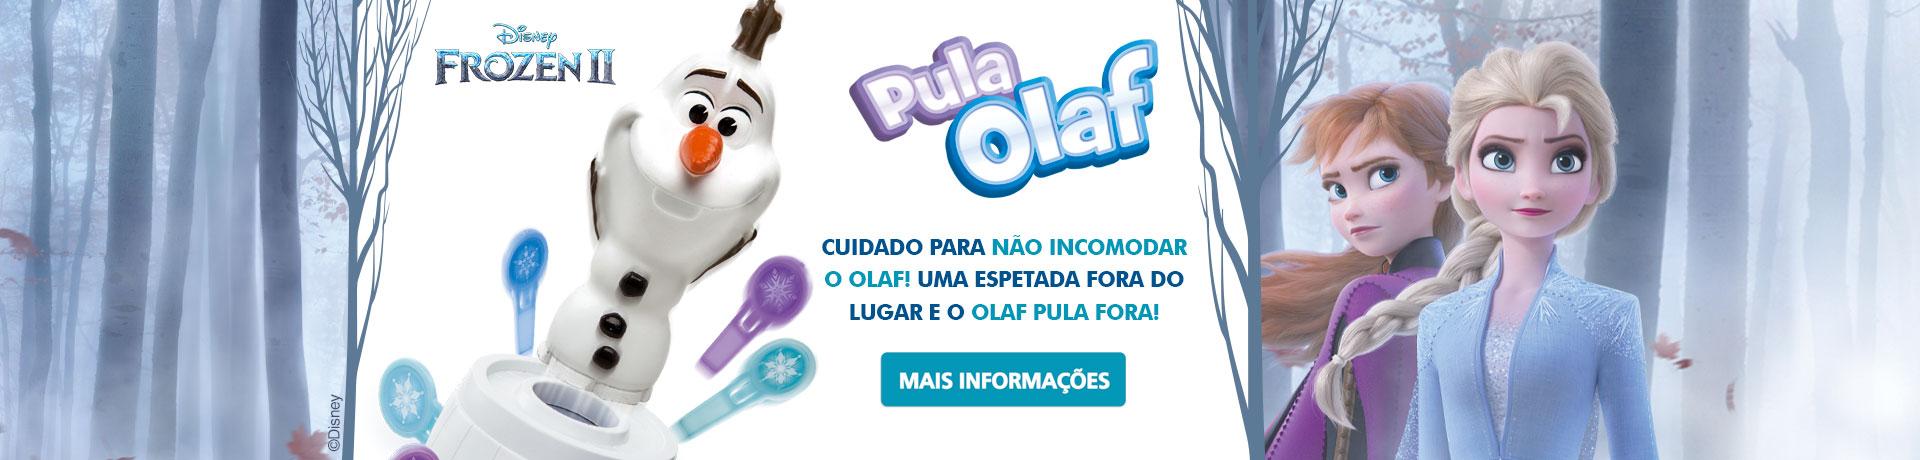 Pula Olaf